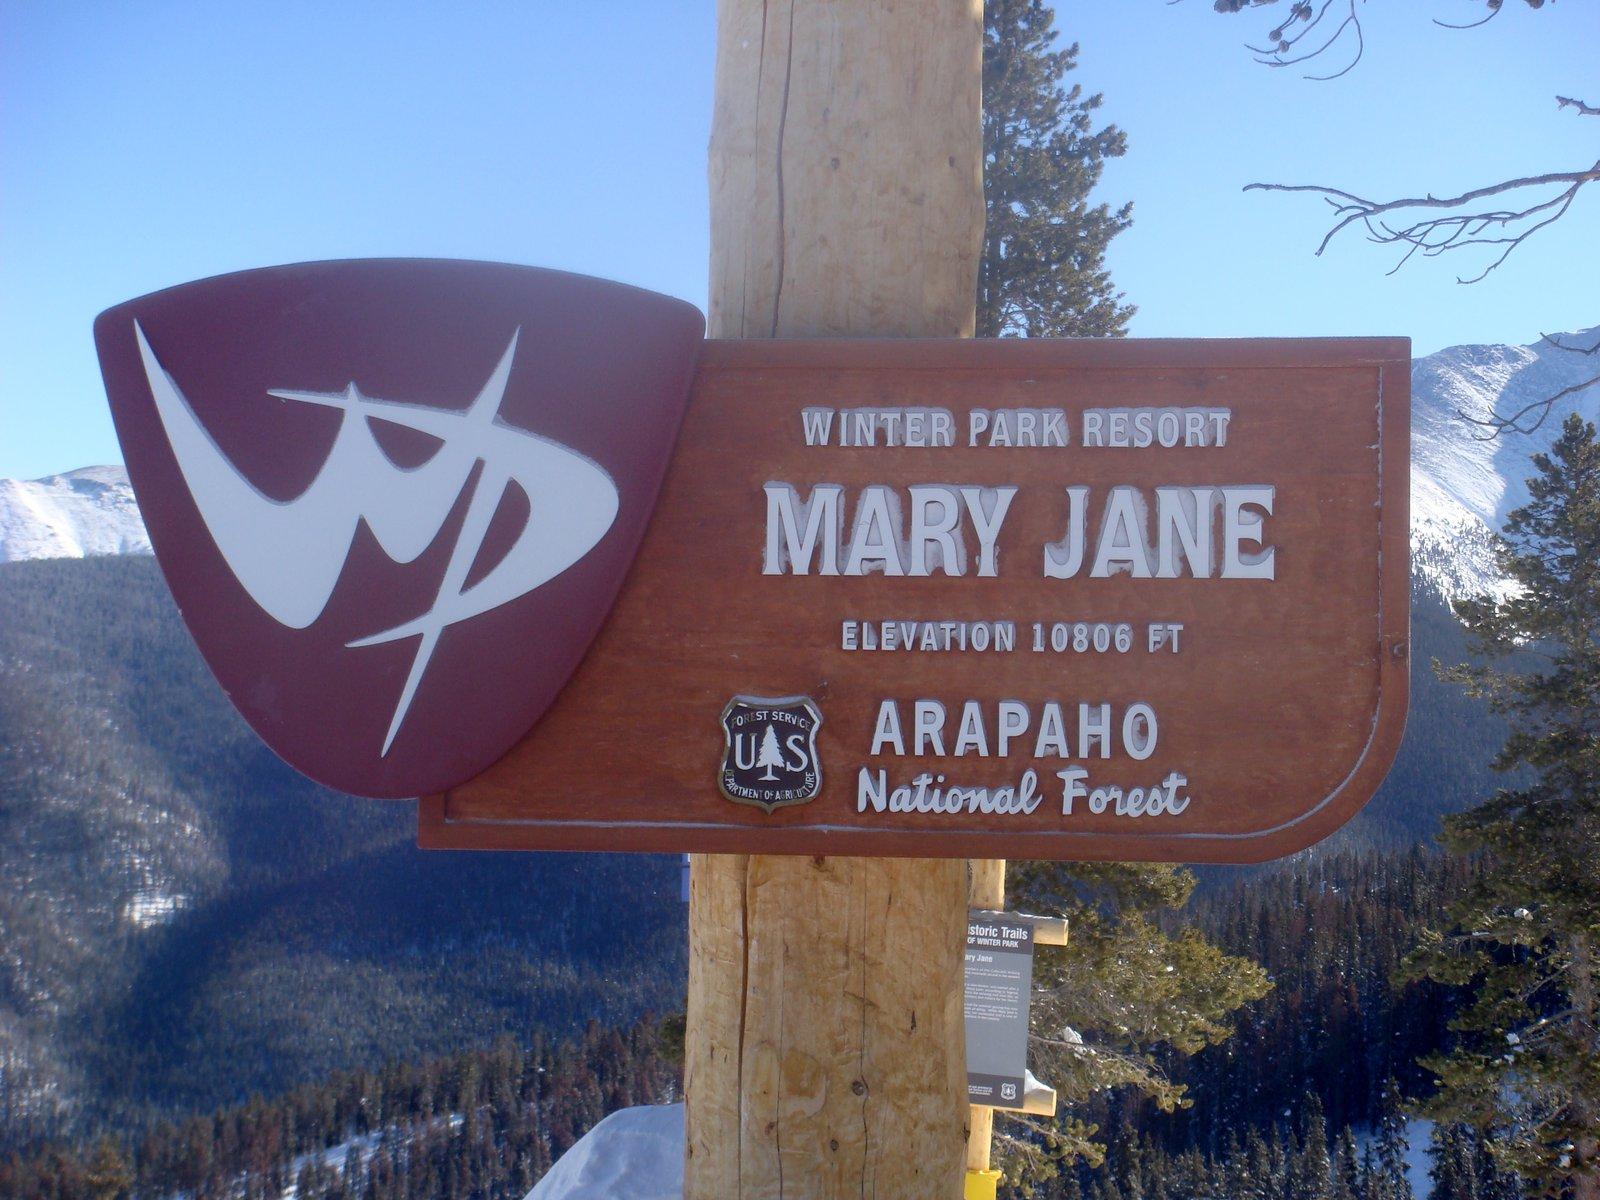 Mary Jane - Get it???